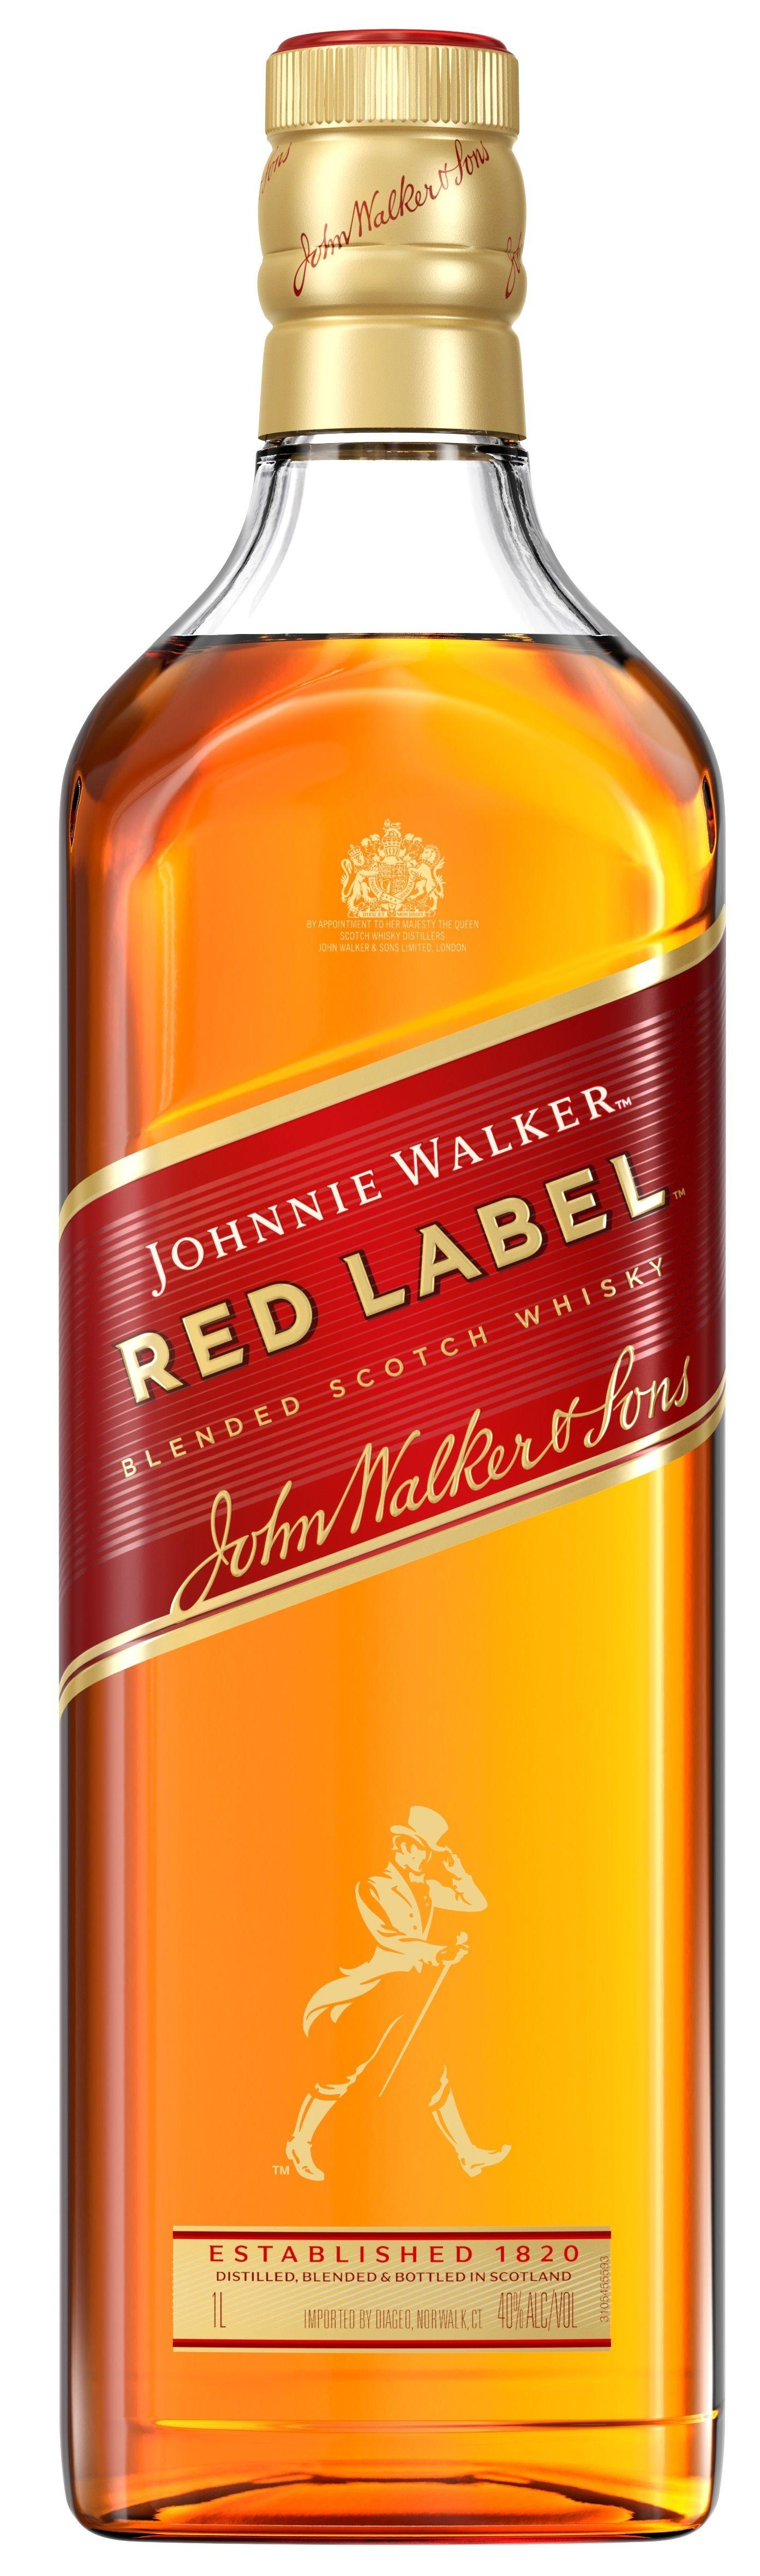 Johnnie walker red label 1l 40% scotch whisky